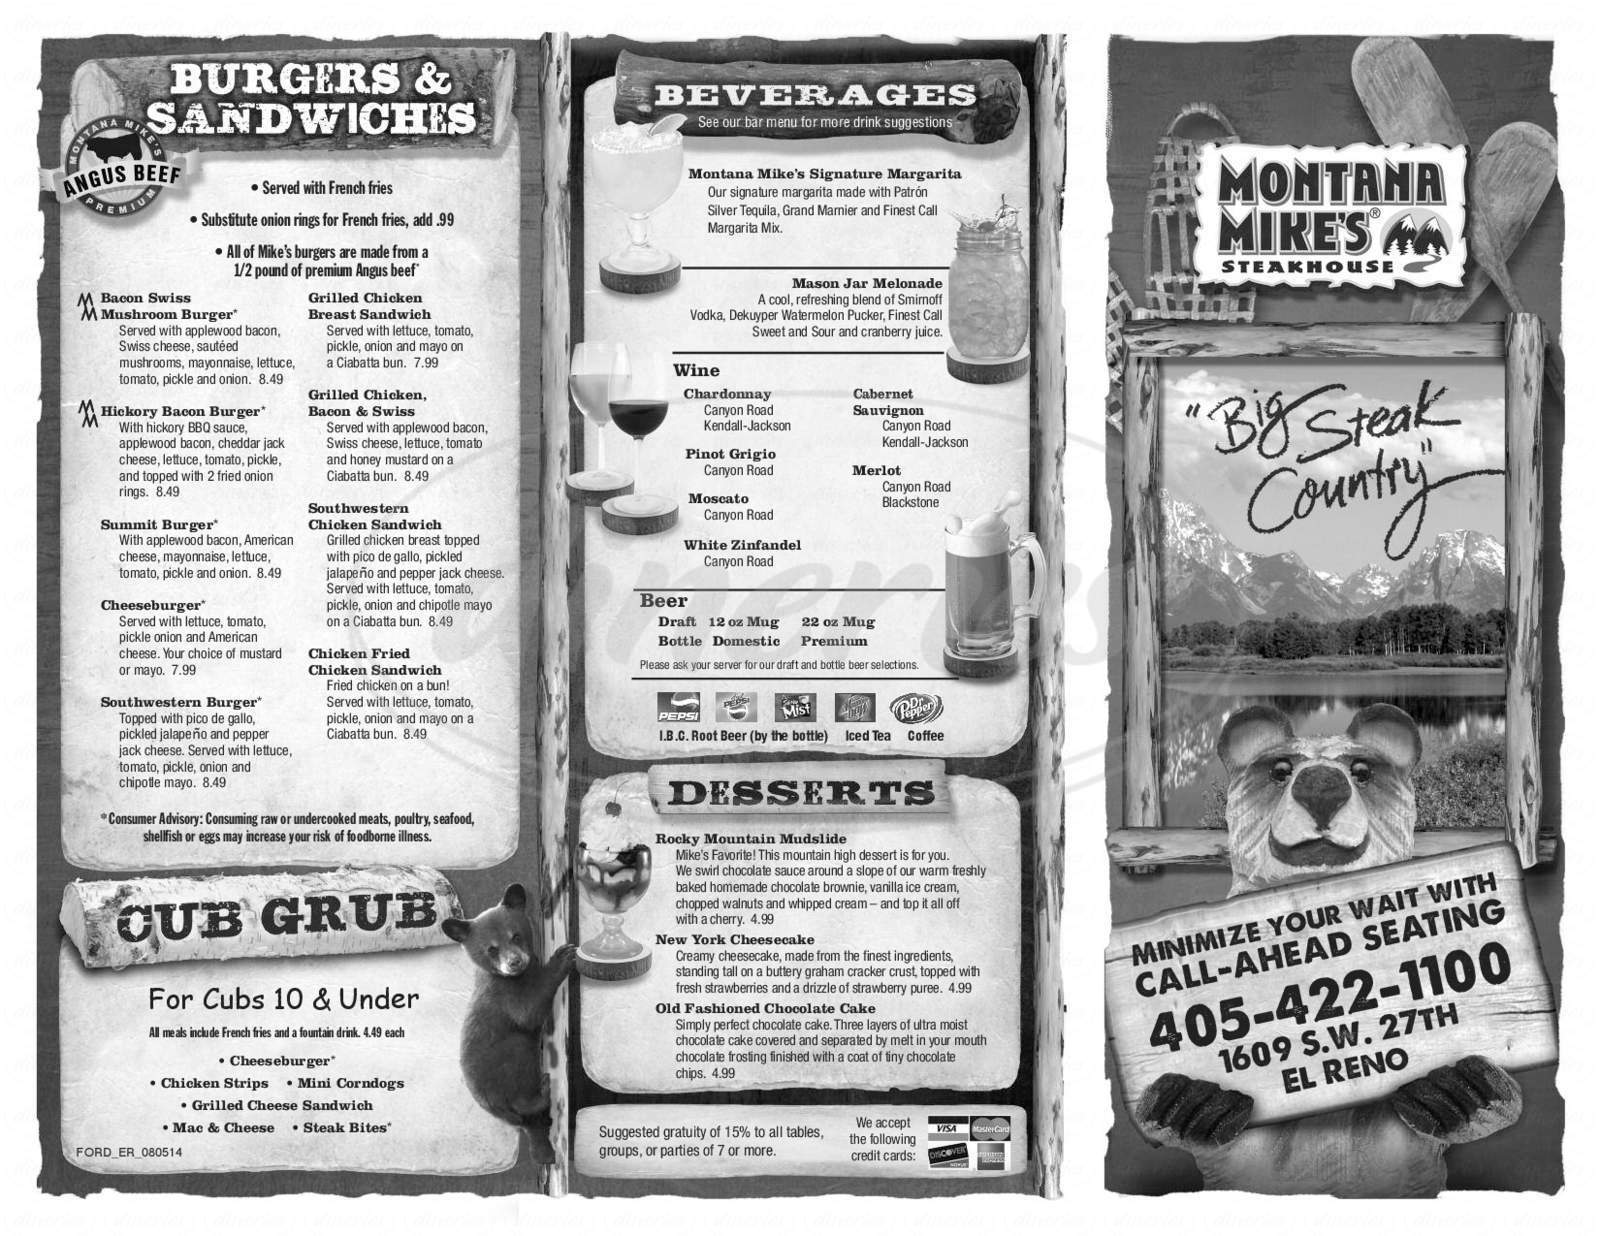 menu for Montana Mike's Steakhouse